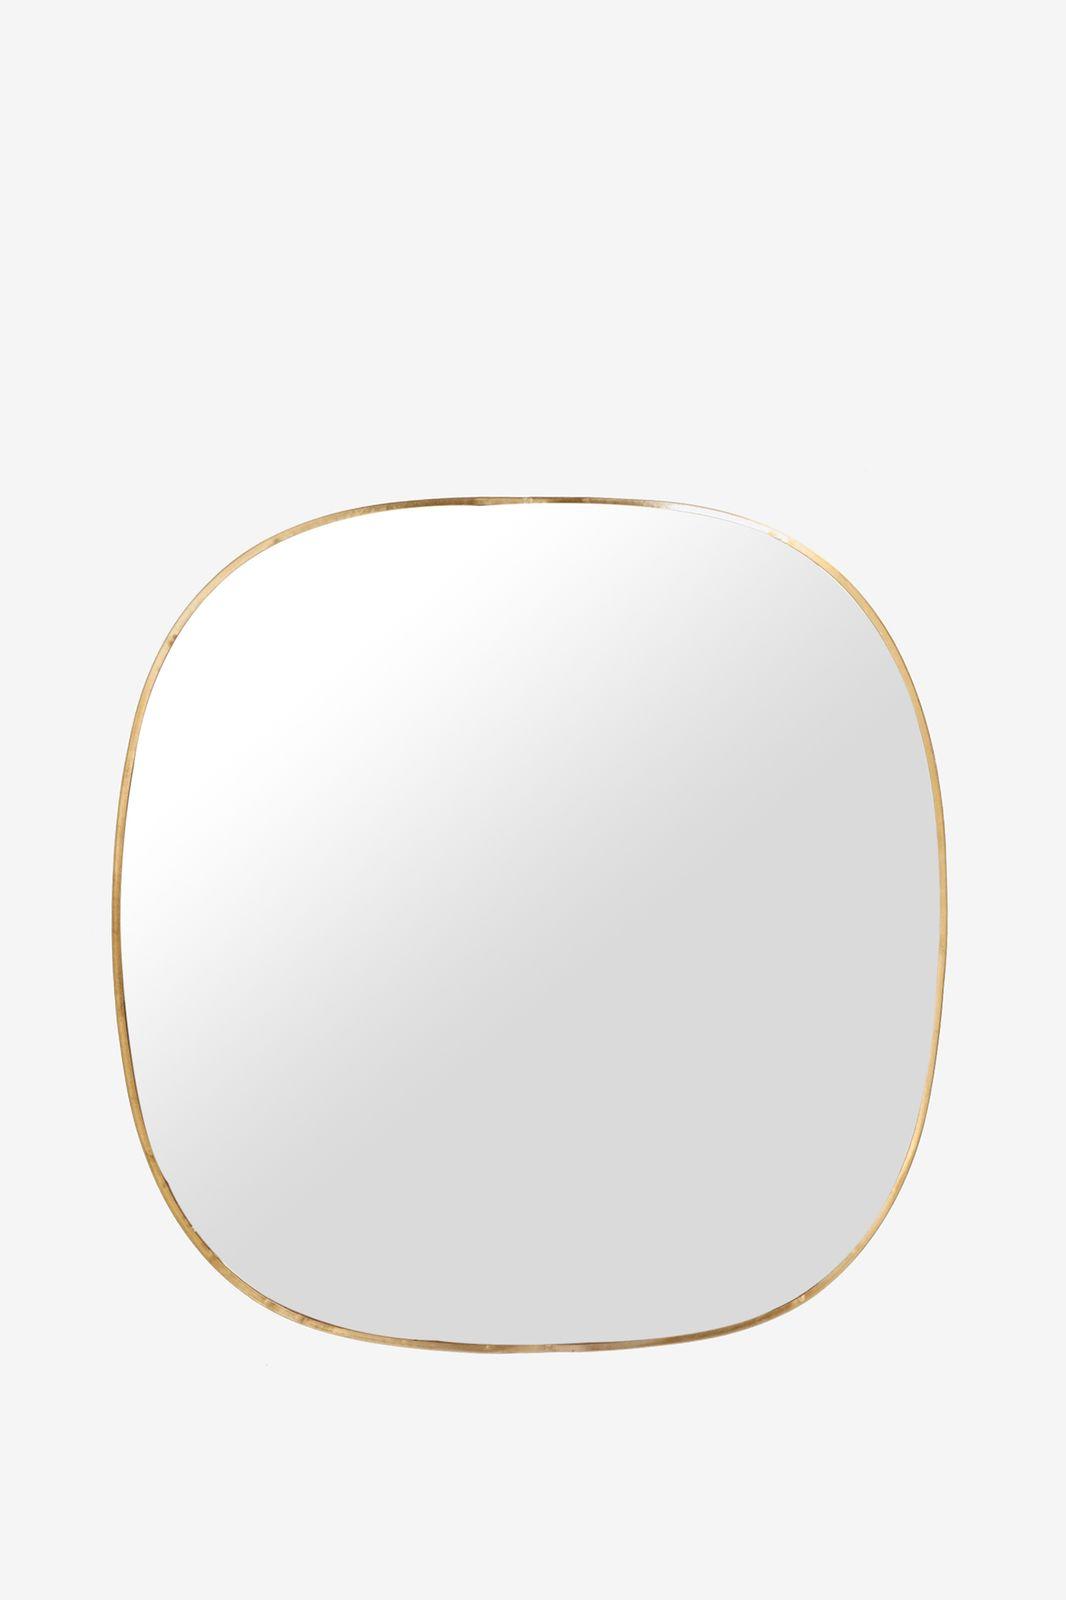 Gouden hangspiegel rond